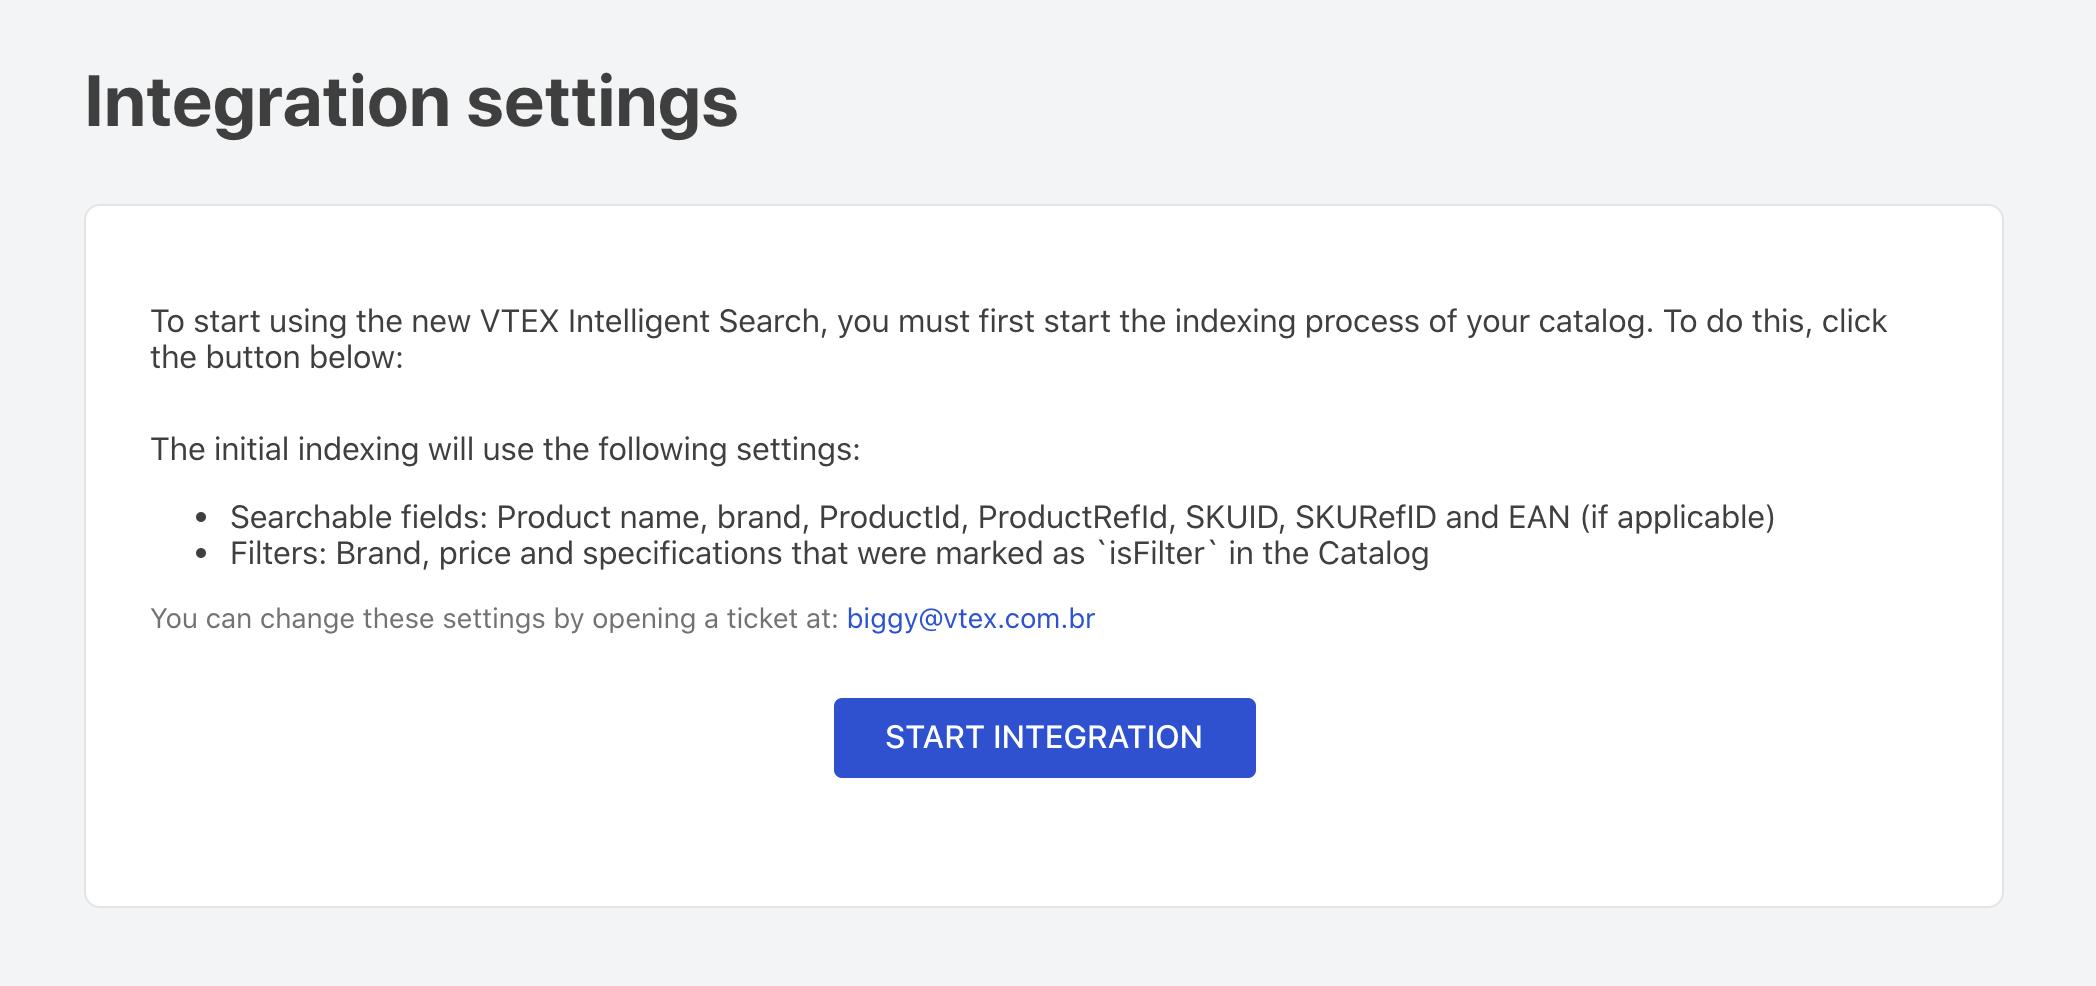 start-integration